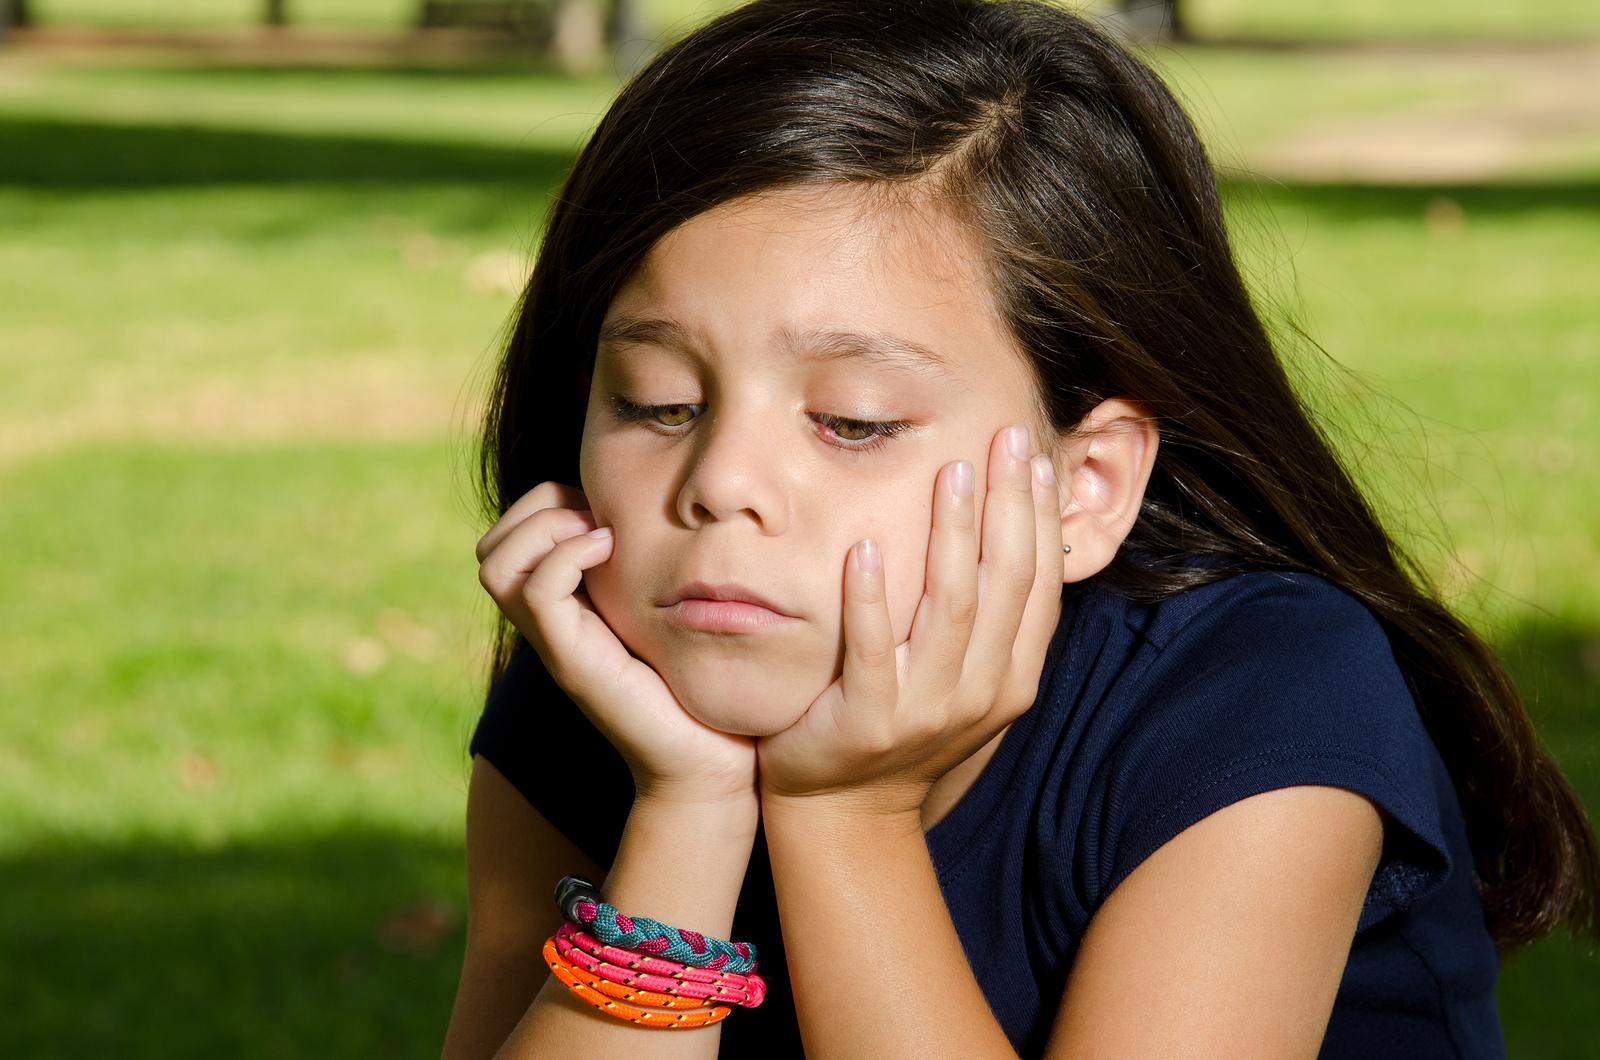 child exhibits adhd symptoms